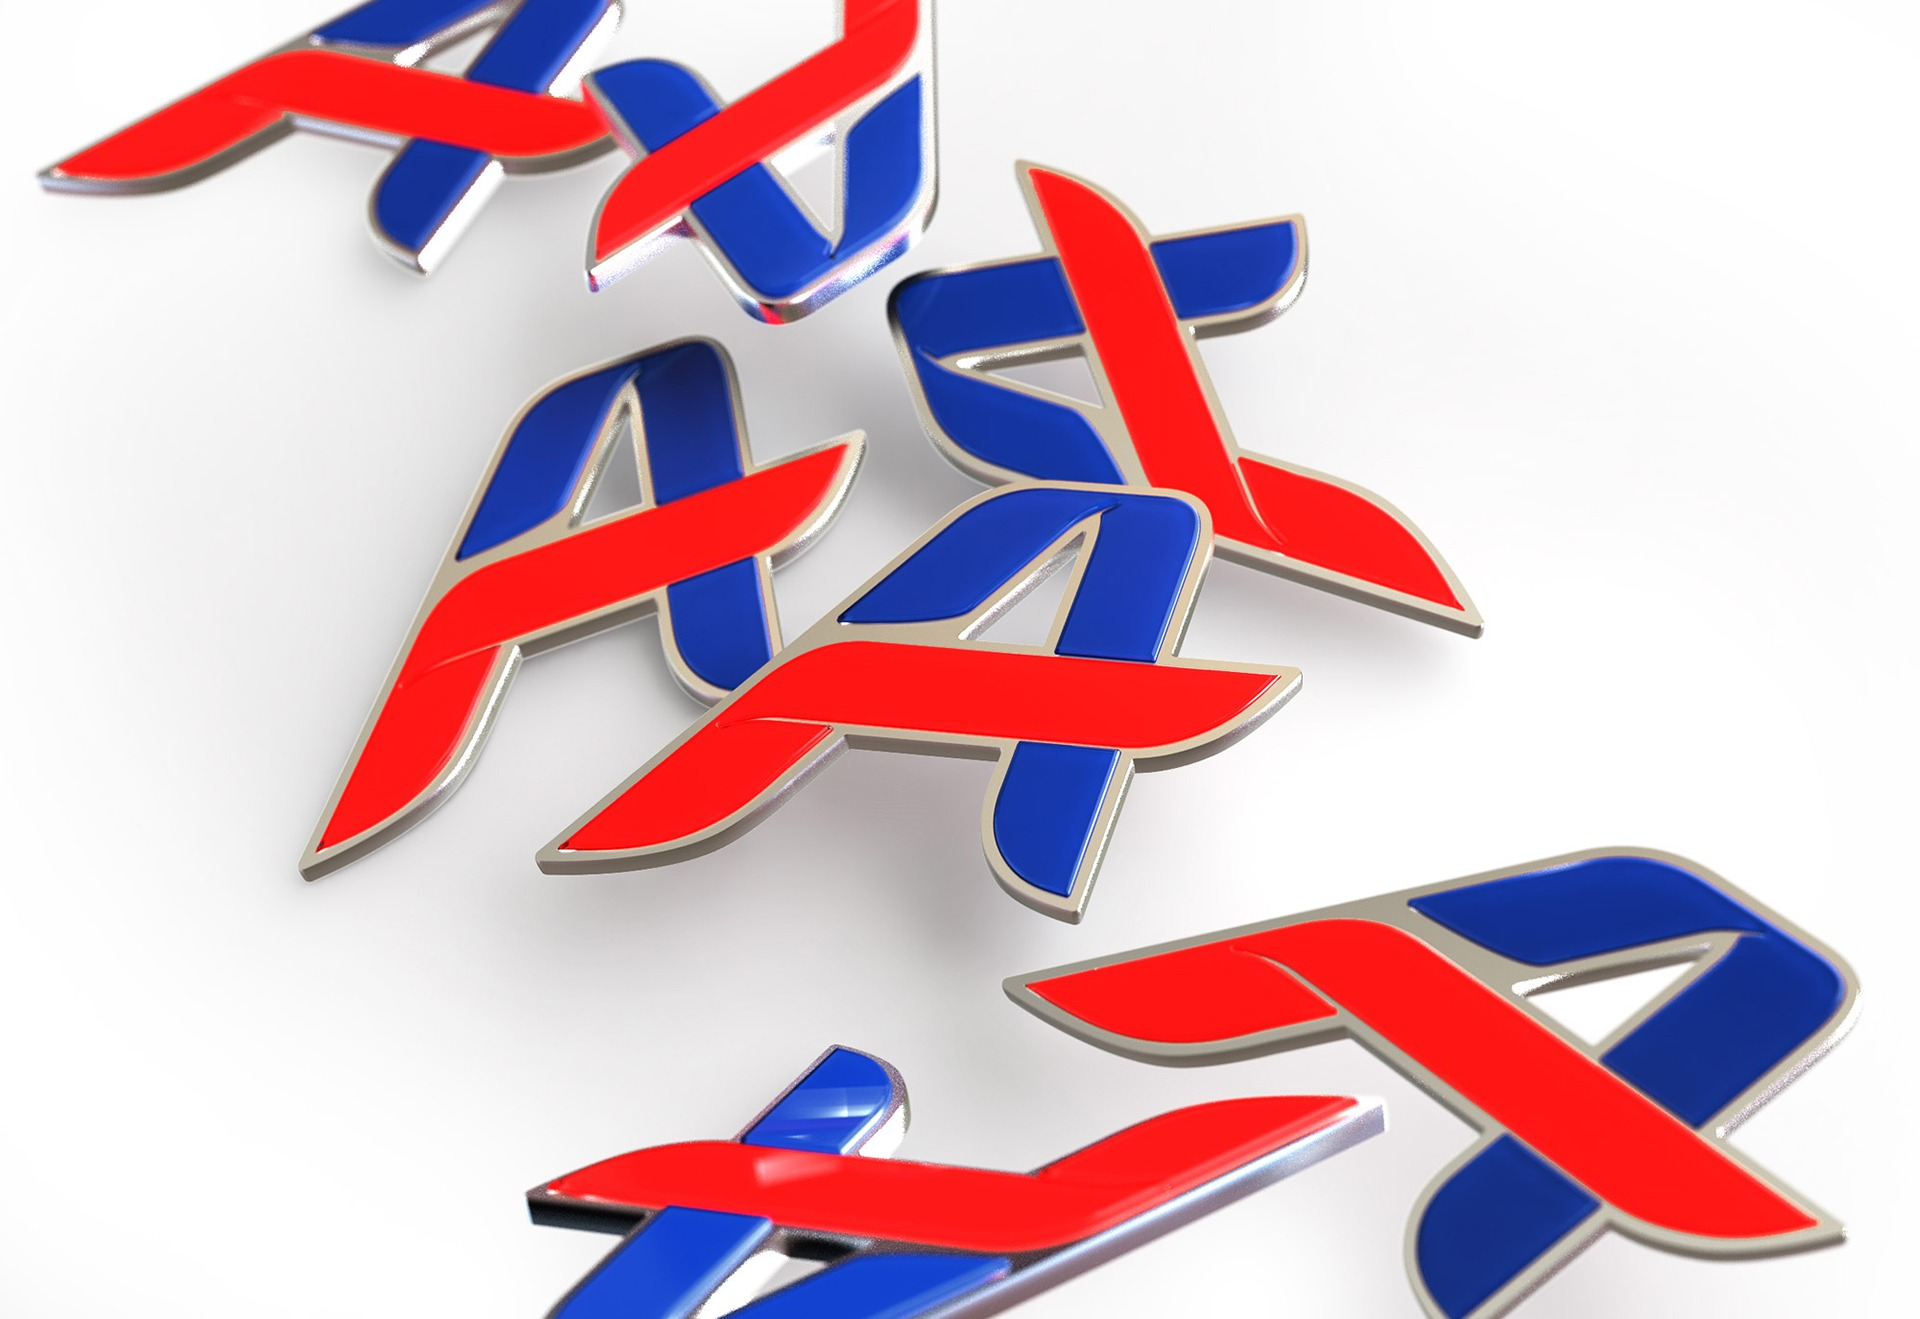 Фирменный стиль авиакомпании Аэрофлот, Asgard Branding, Асгард, лого Аэрофлот, значки, Aeroflot airlines, Aeroflot badges